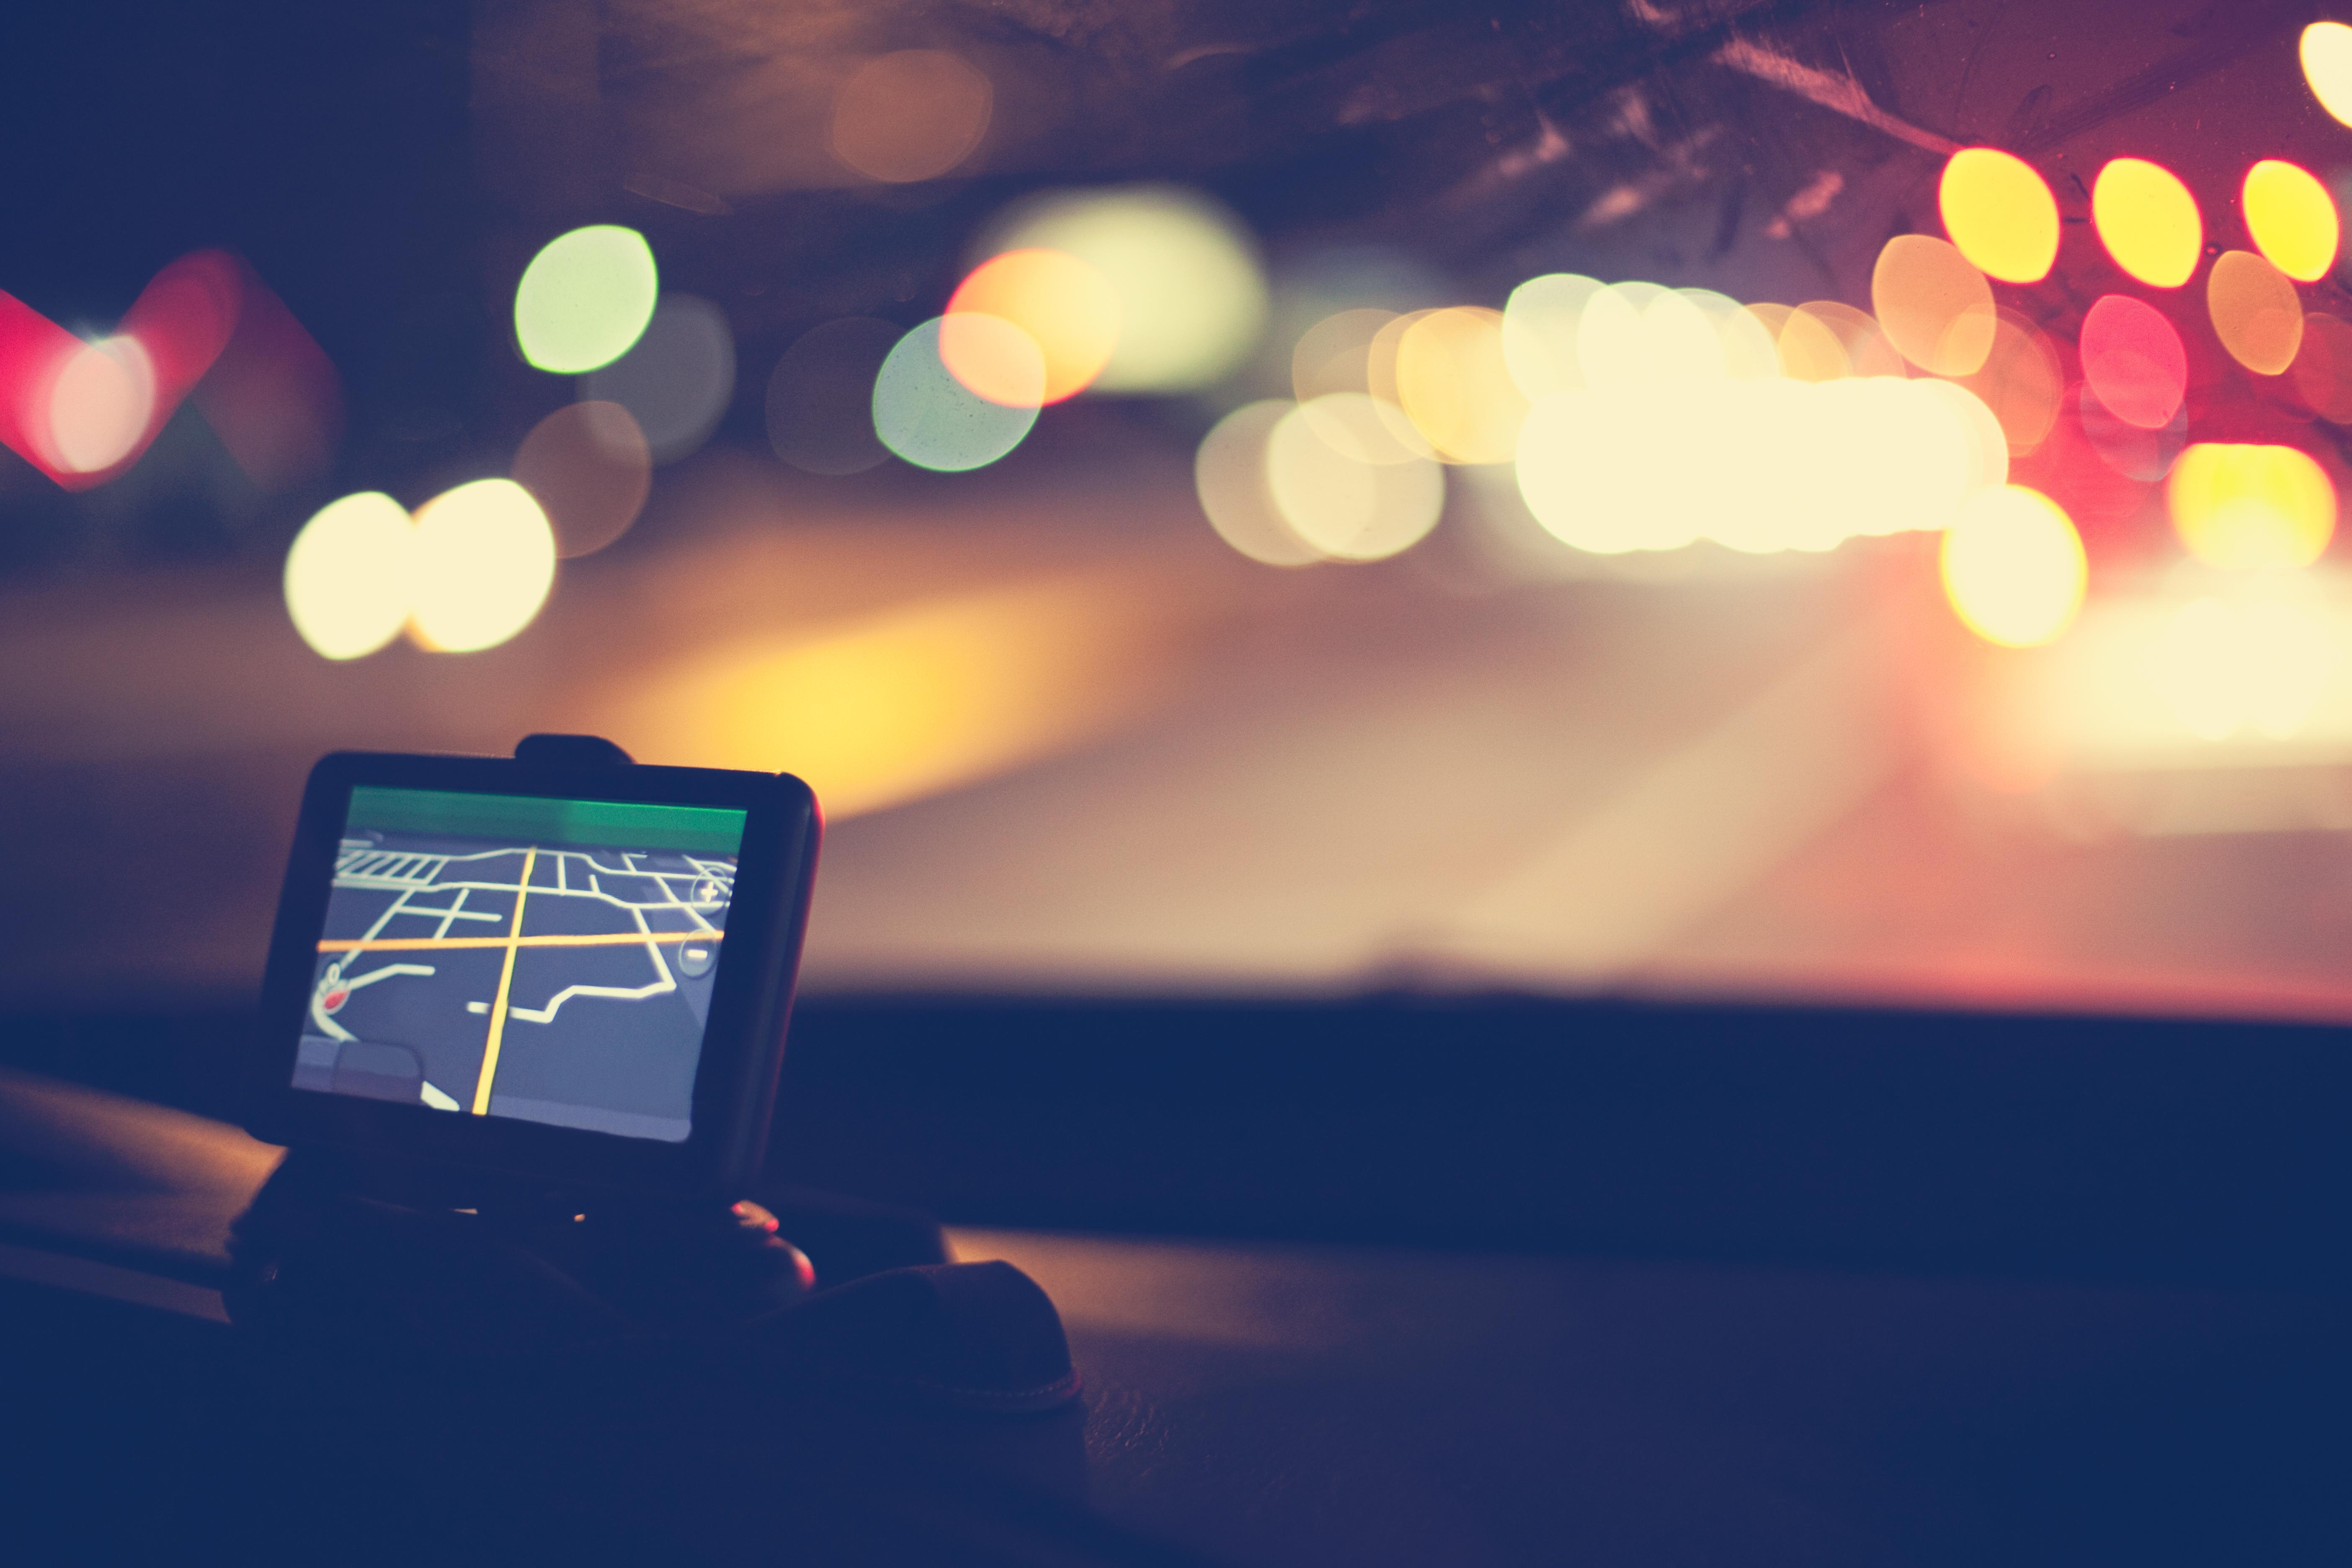 GPS navigational system on dashboard of car